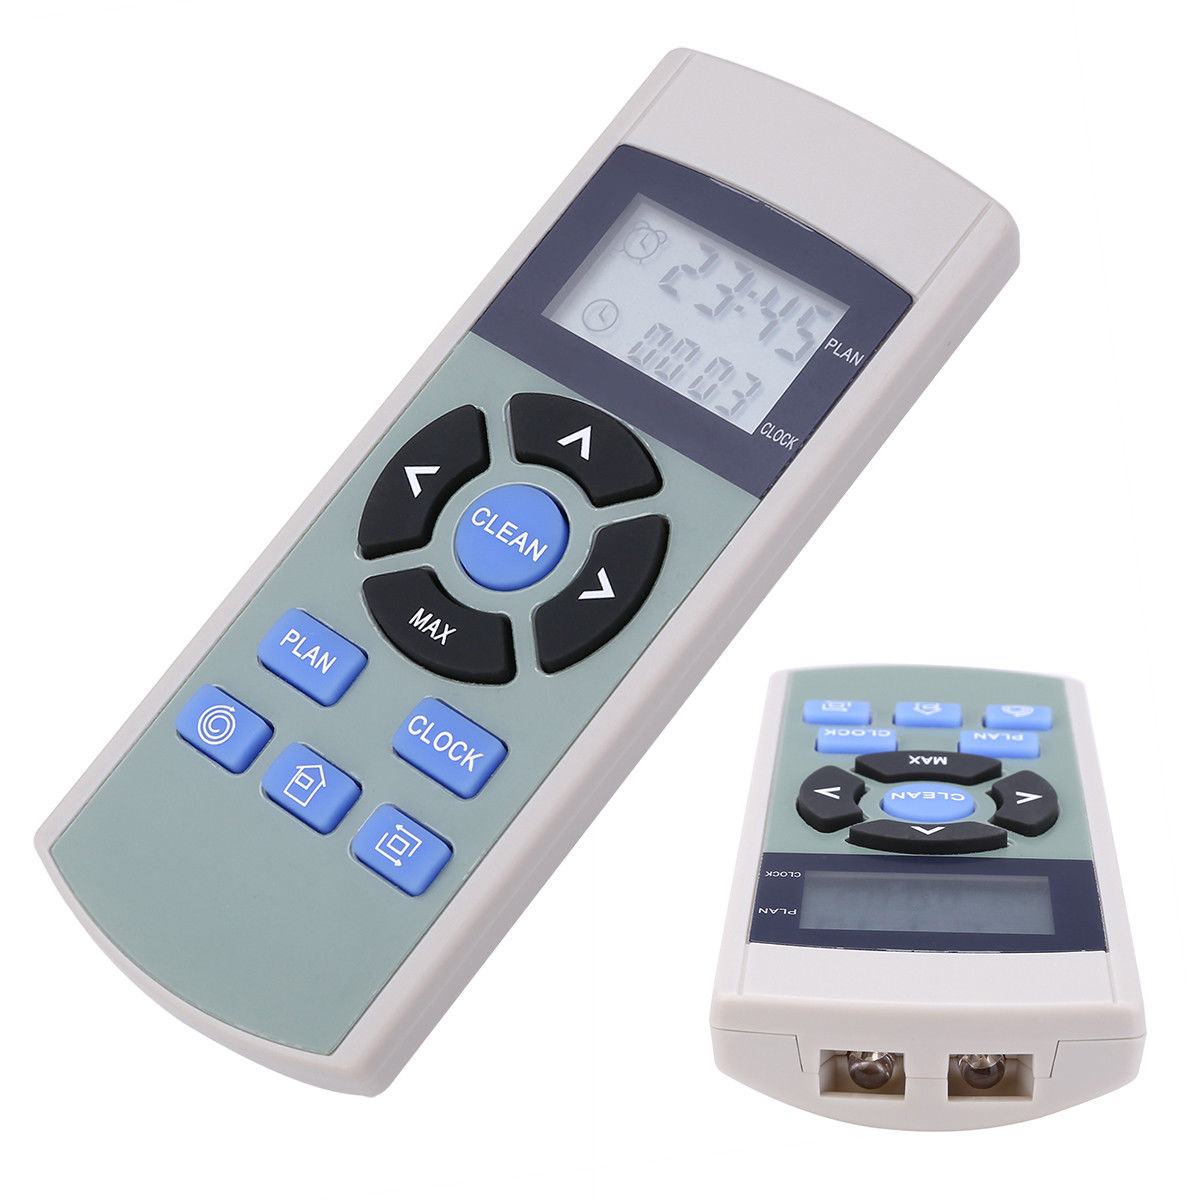 Tuya Smart Remote Control For V3s A4 A4s V5 V5s V7 V7s PRO V7s Robotic Vacuum Cleaner Lampada Inteligente Tuya Smart Life